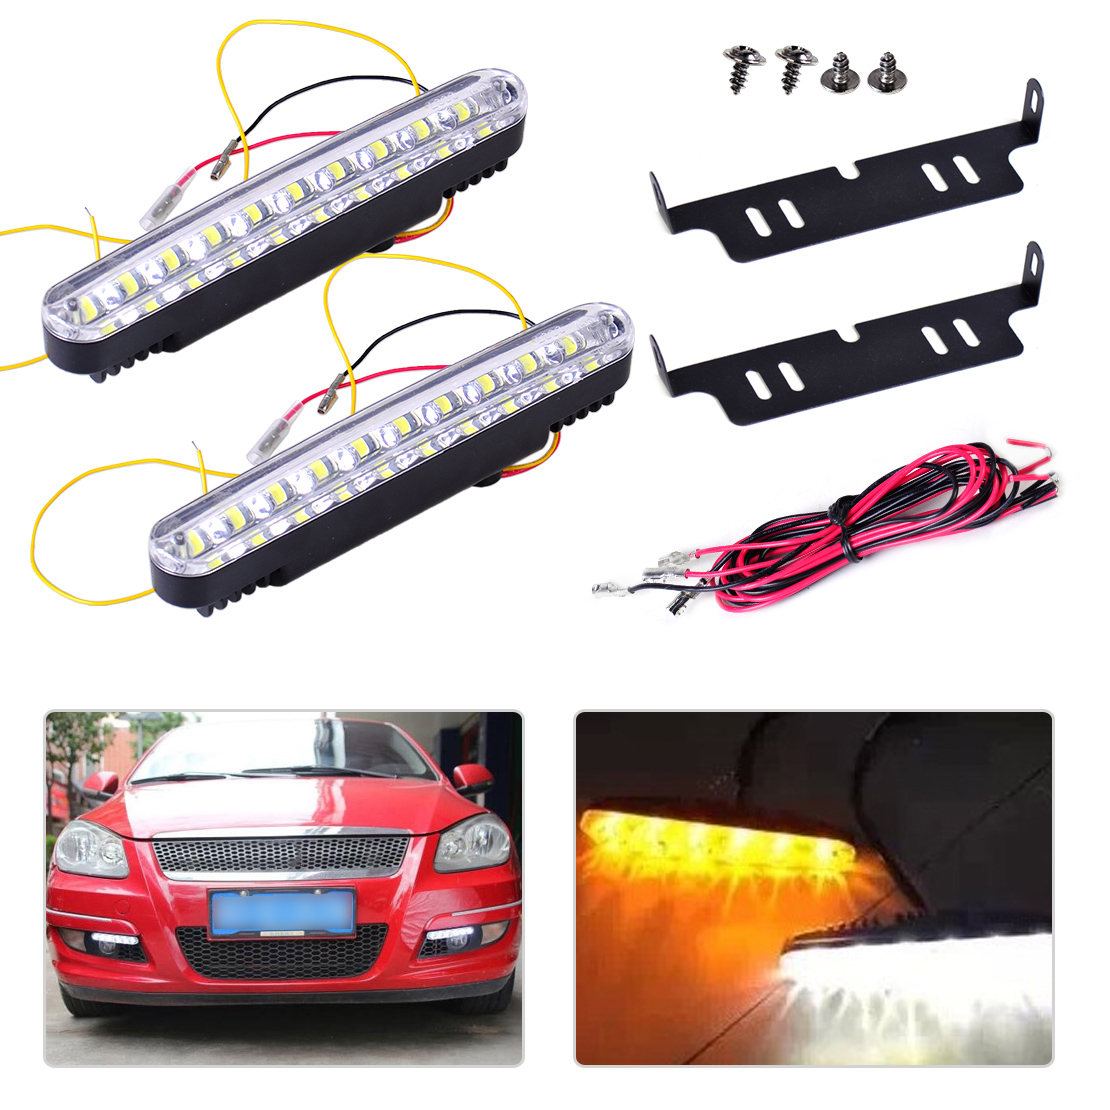 DWCX 2pcs Car SUV Trucks 12V 30 <font><b>LED</b></font> <font><b>Daytime</b></font> <font><b>Running</b></font> Light Driving <font><b>Lamp</b></font> White Amber Turn Signal Fog <font><b>Lamp</b></font> Bright Strip